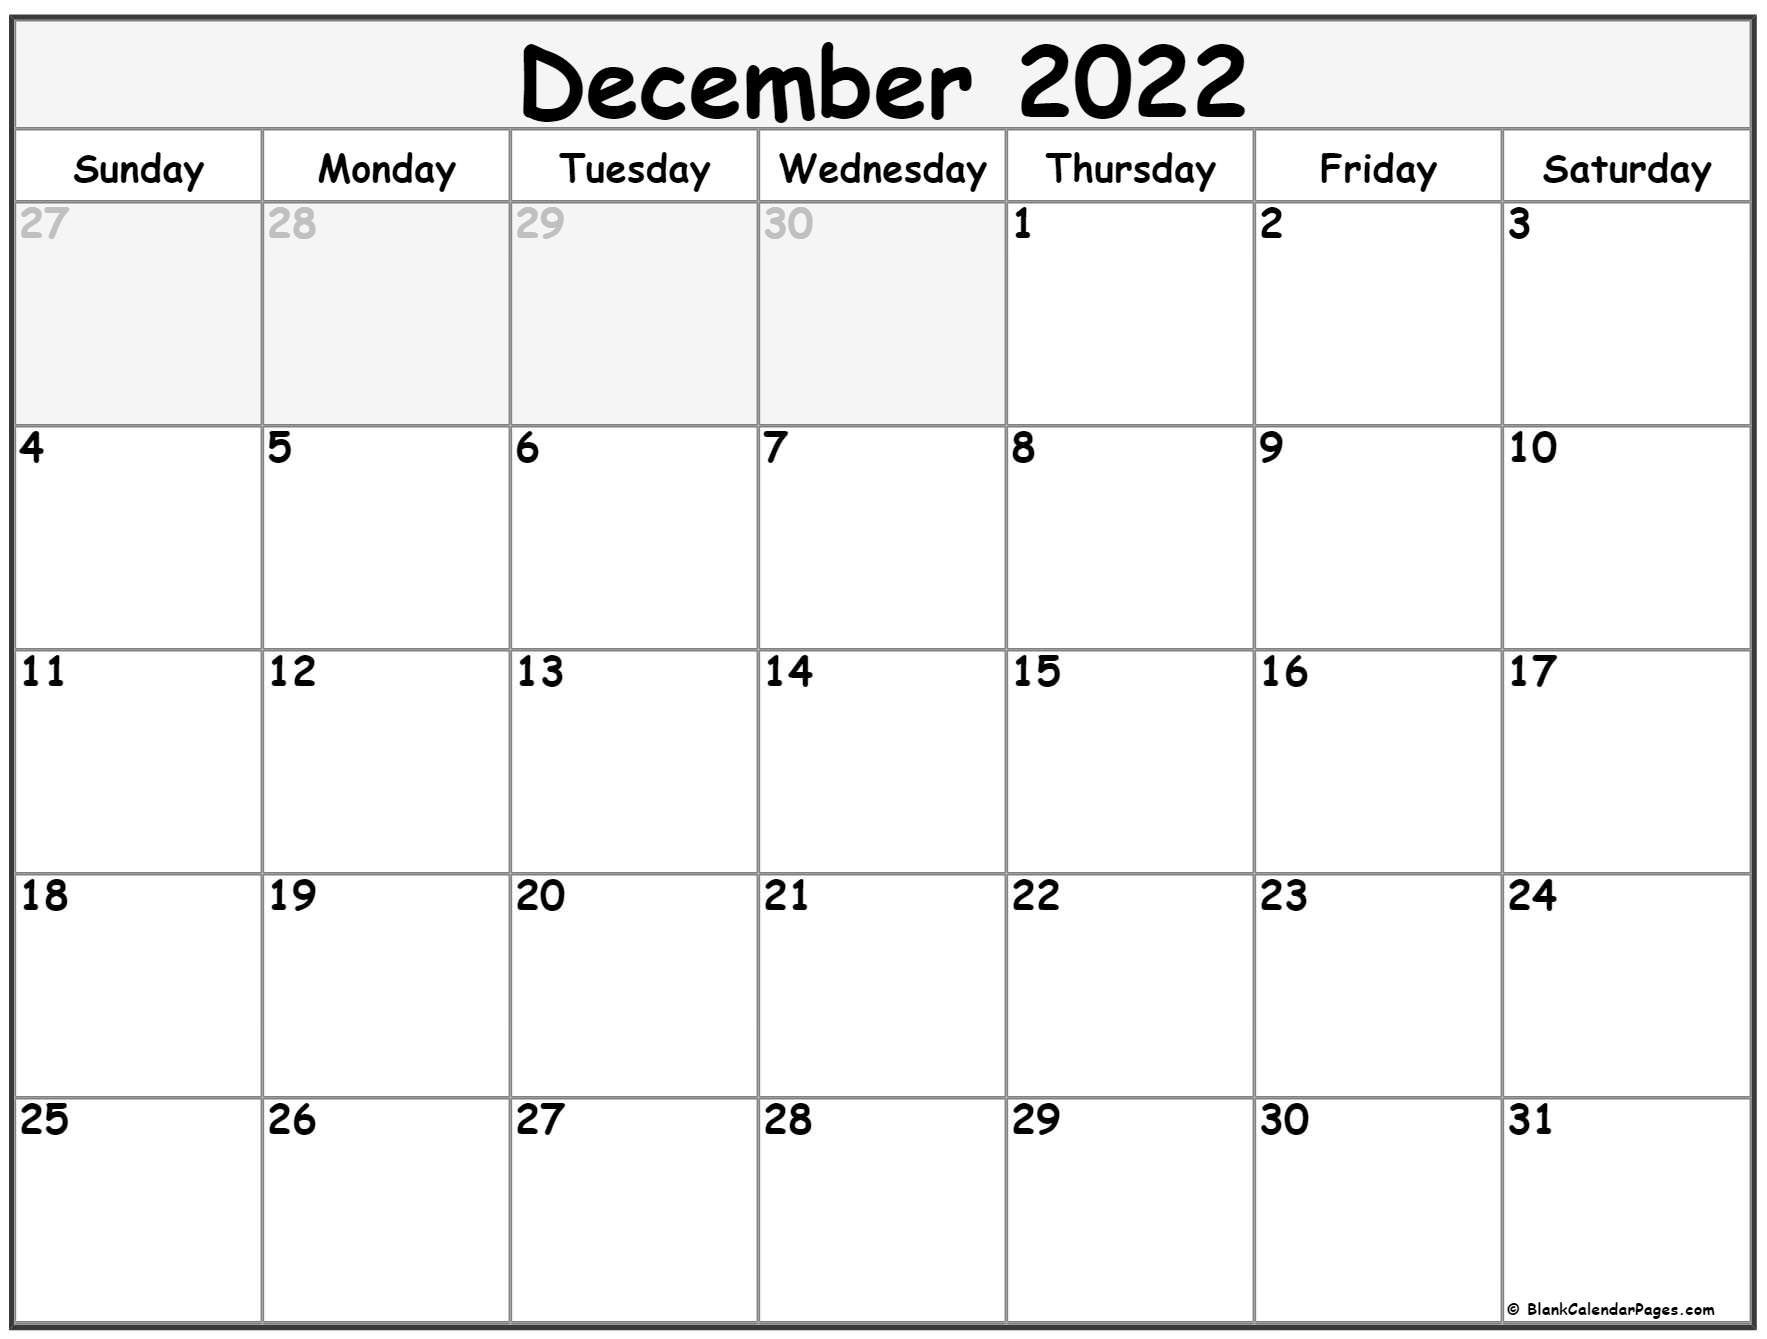 December 2022 calendar   free printable monthly calendars